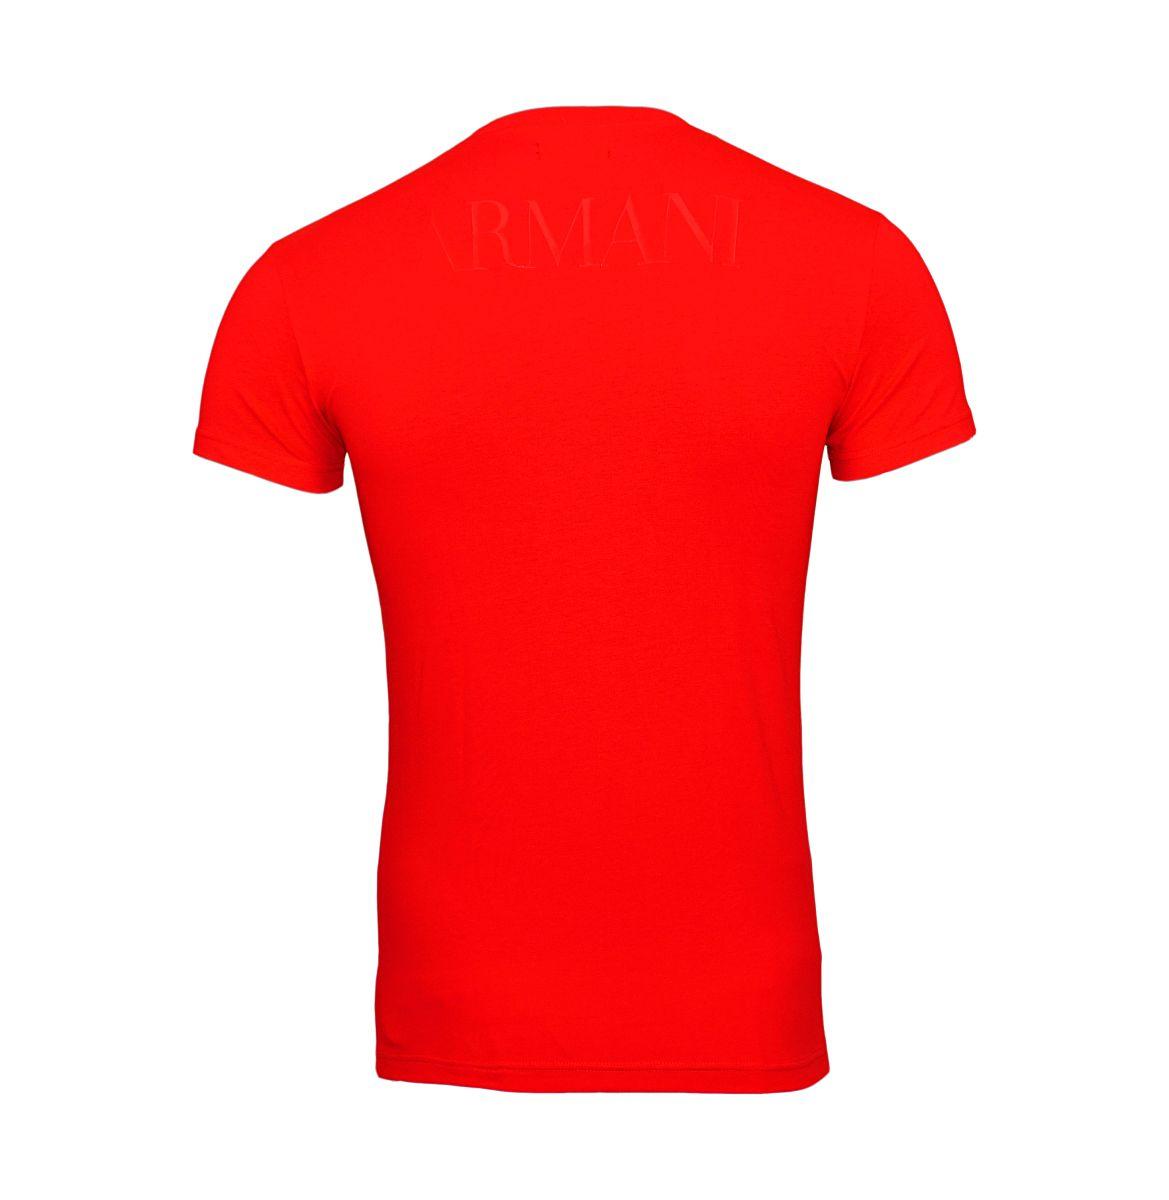 Emporio Armani T-Shirt Rundhals 111035 8P516 17574 TANGO RED W18-EATS1